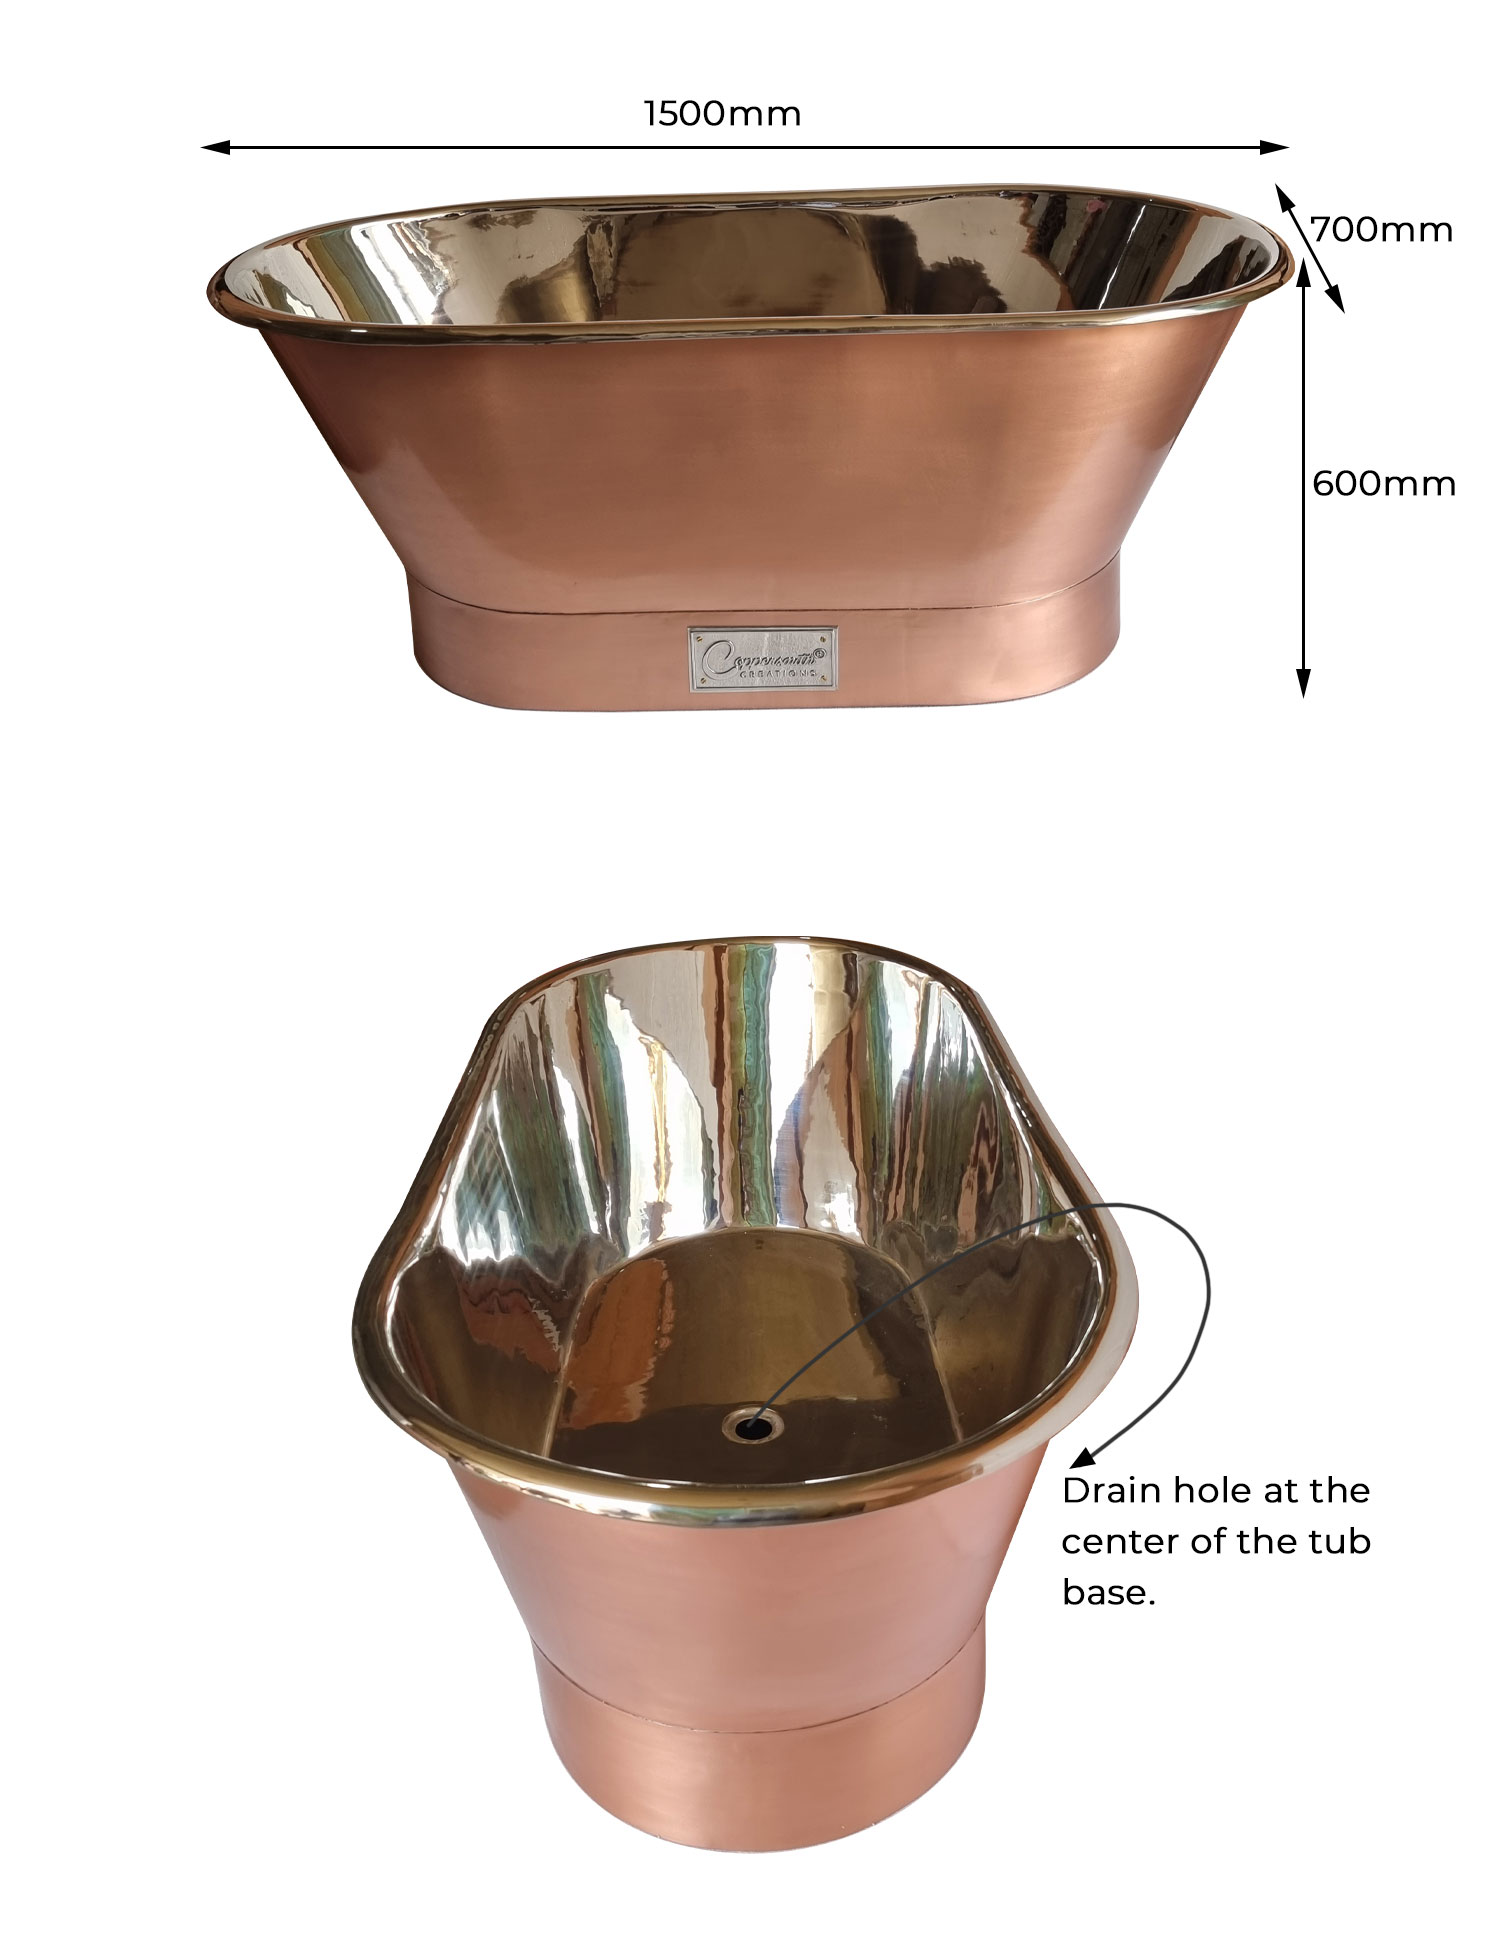 Straight Base Copper Bathtub Brushed Copper Exterior & Polished Nickel Interior